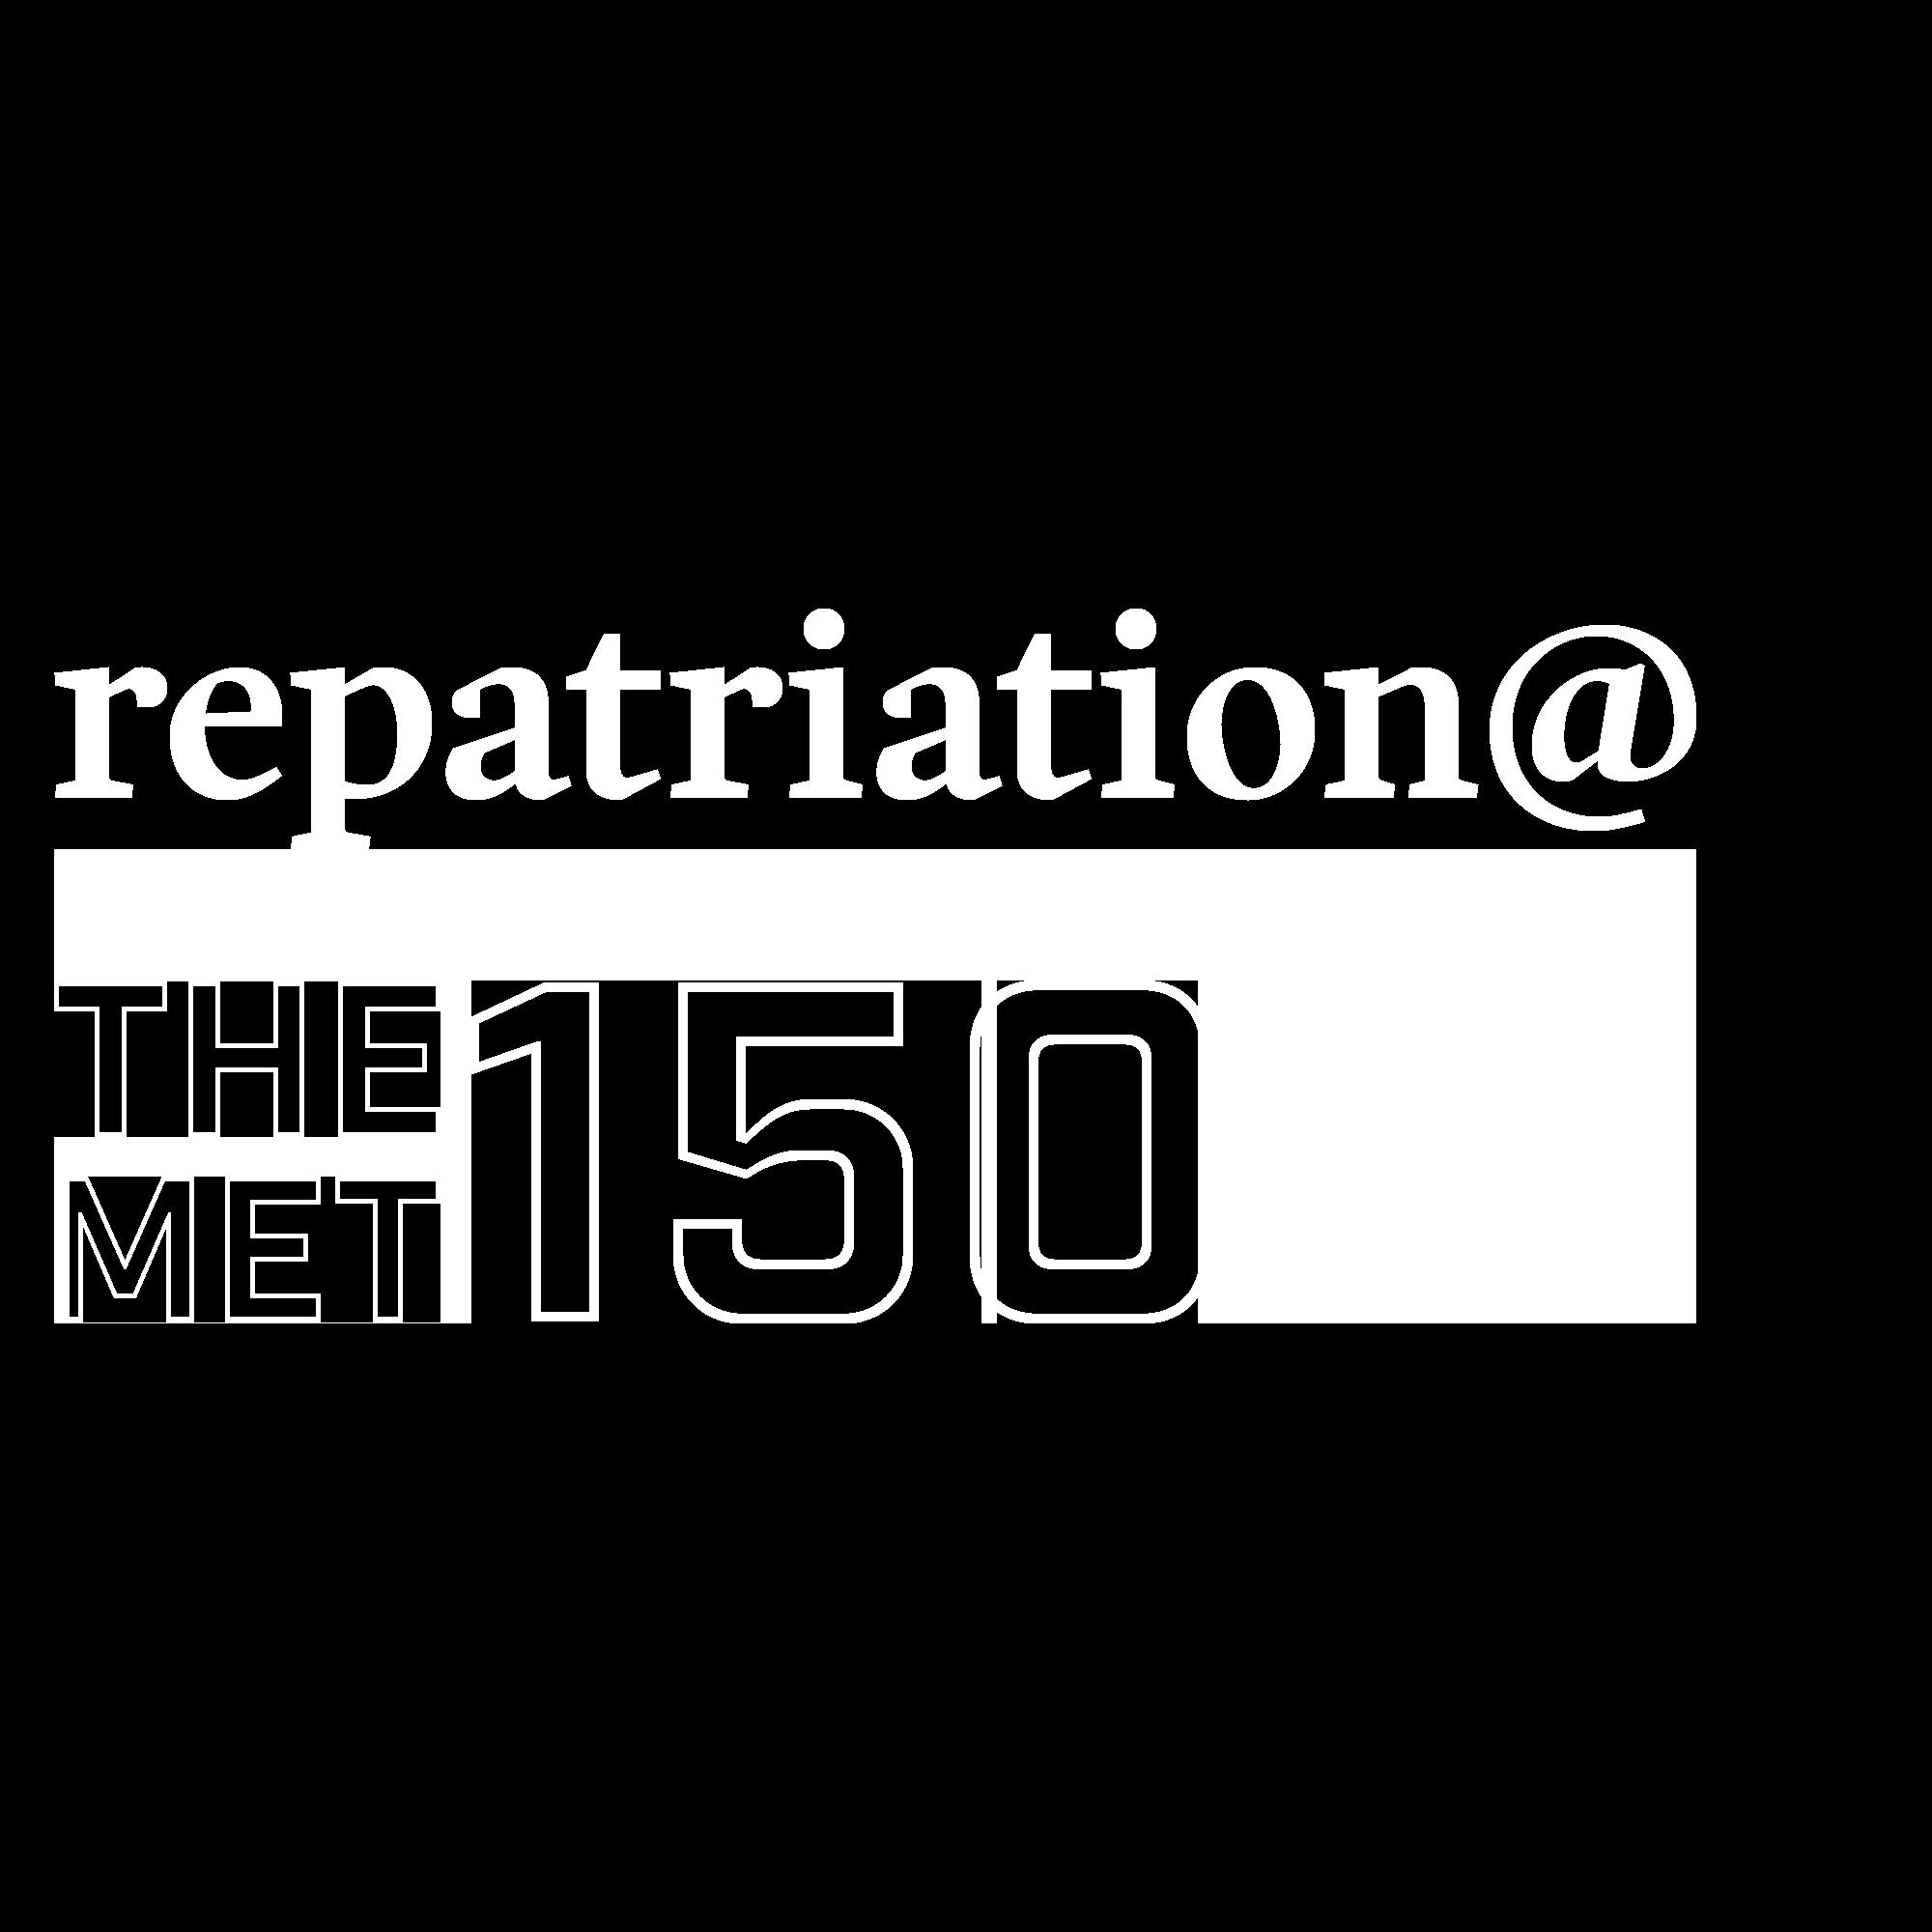 repatriation@THEMET150